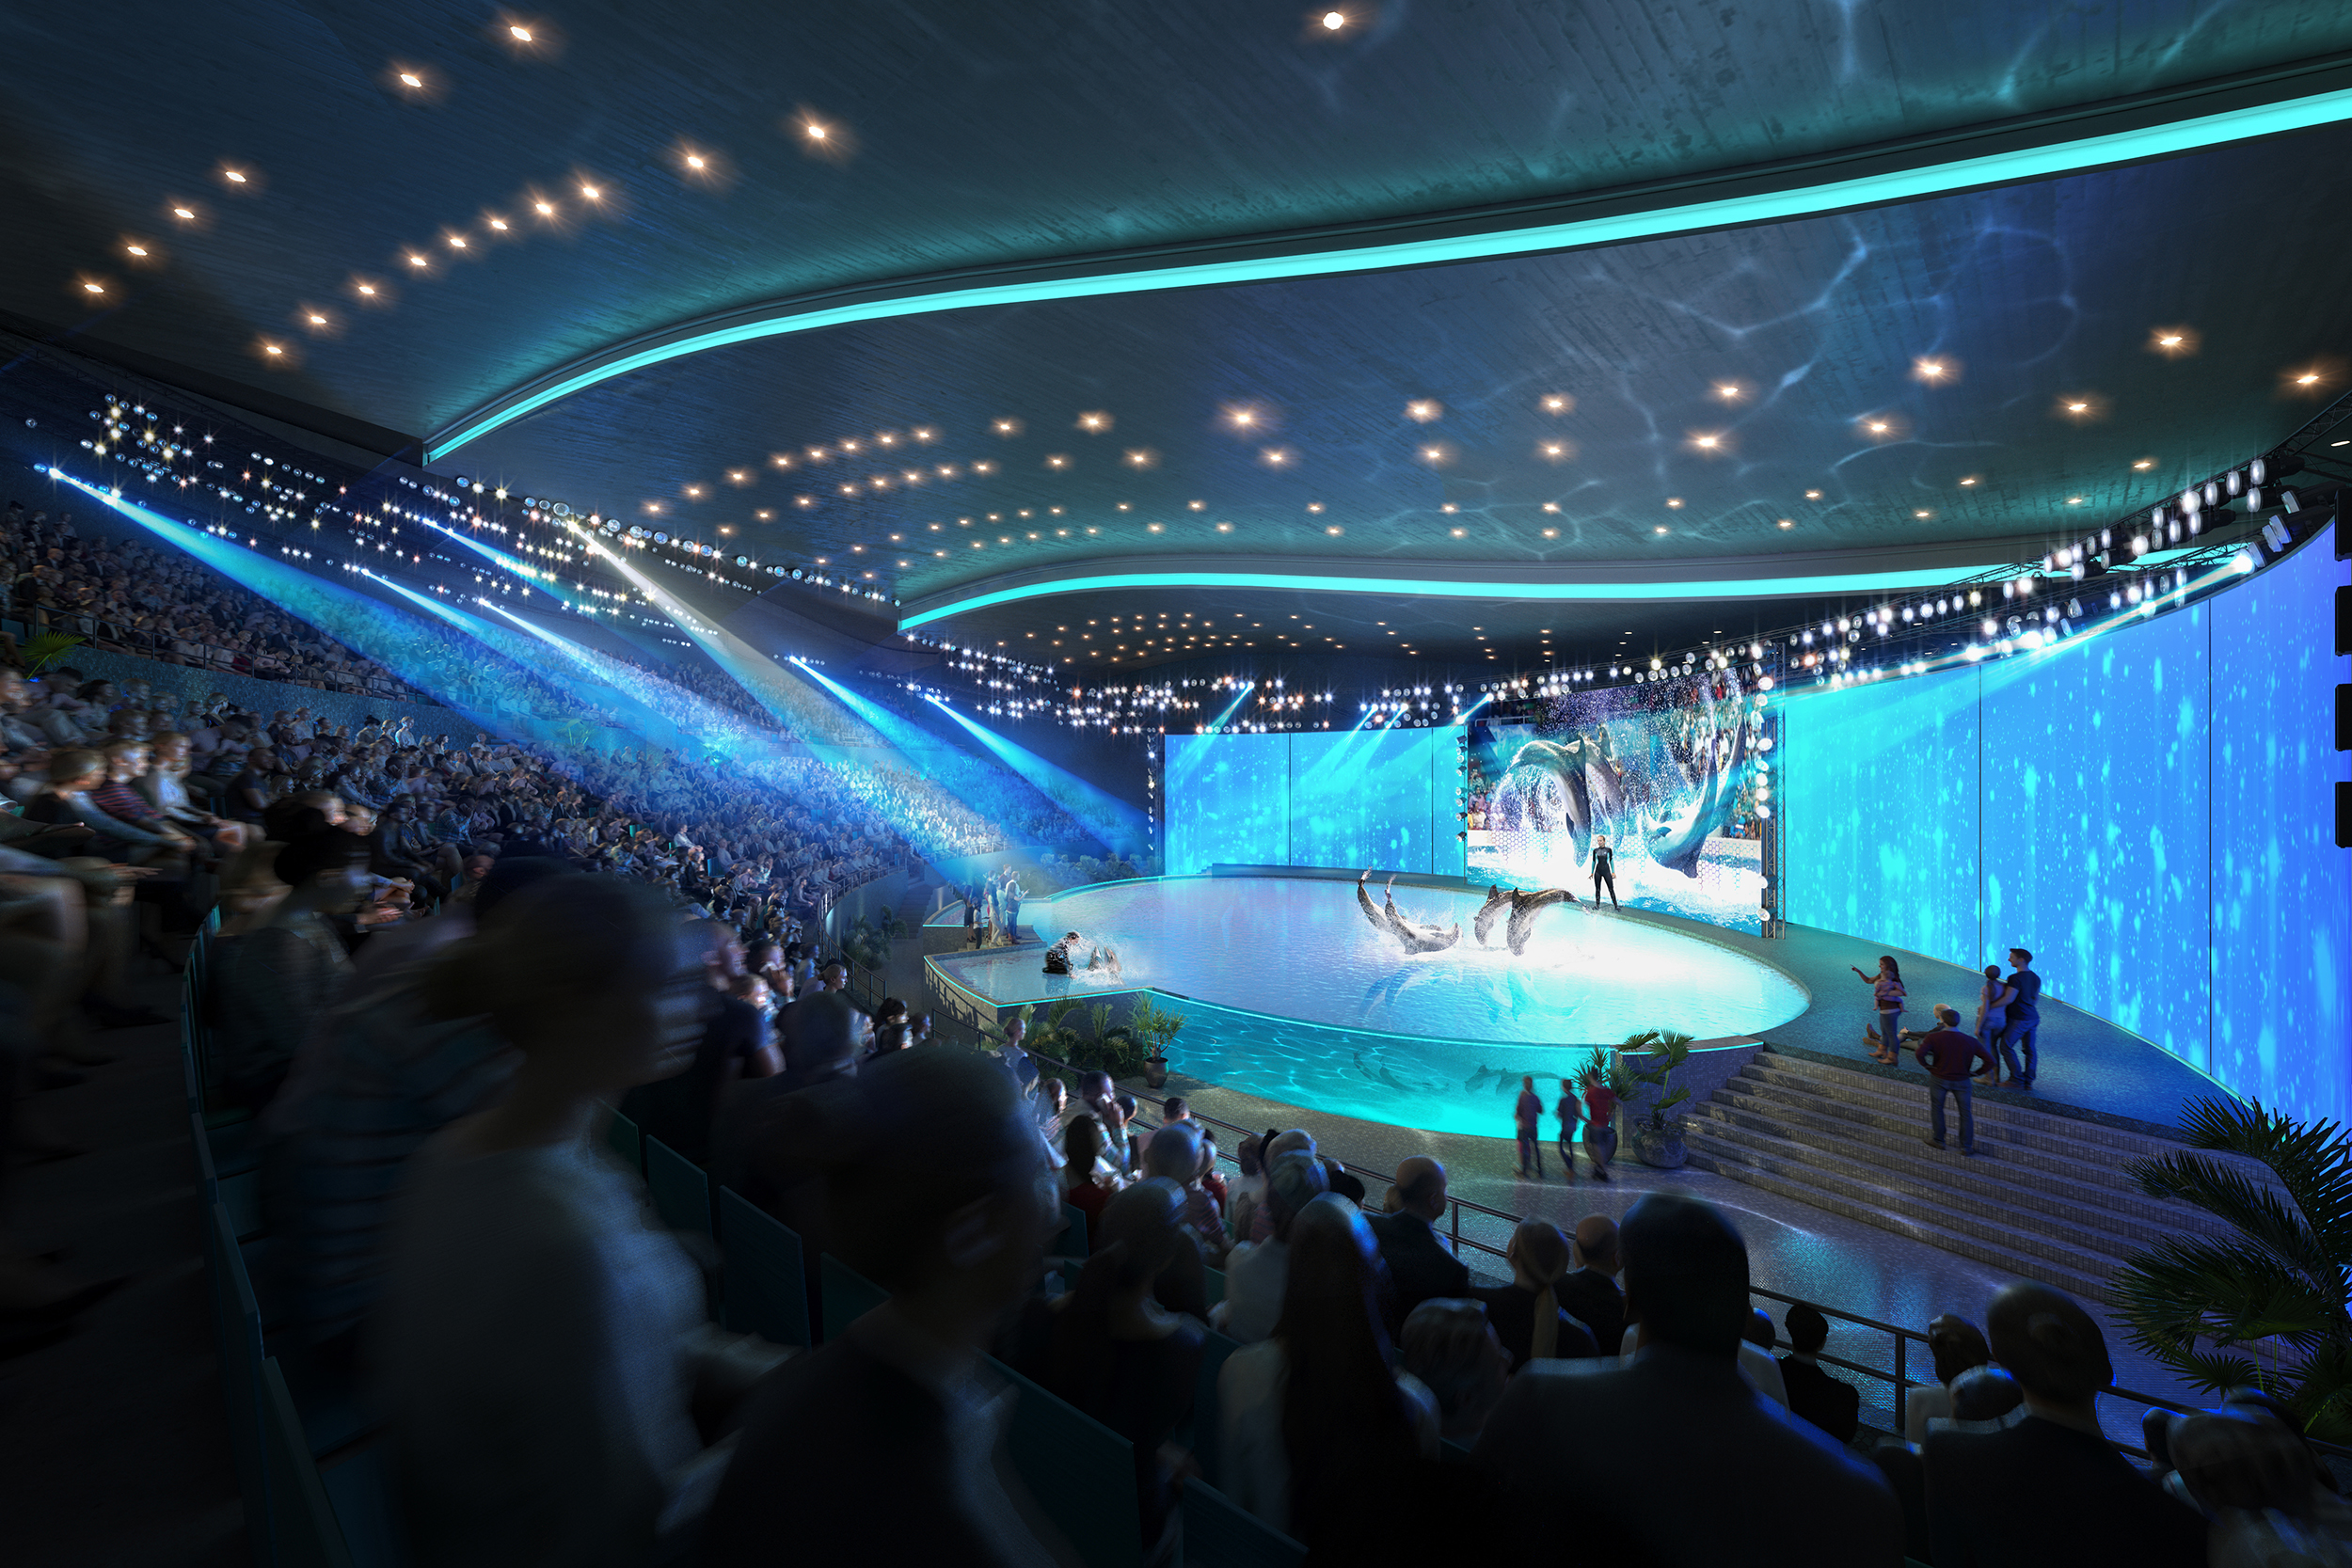 Binyan's hyperrealistic renderings of an aquarium in Beijing.